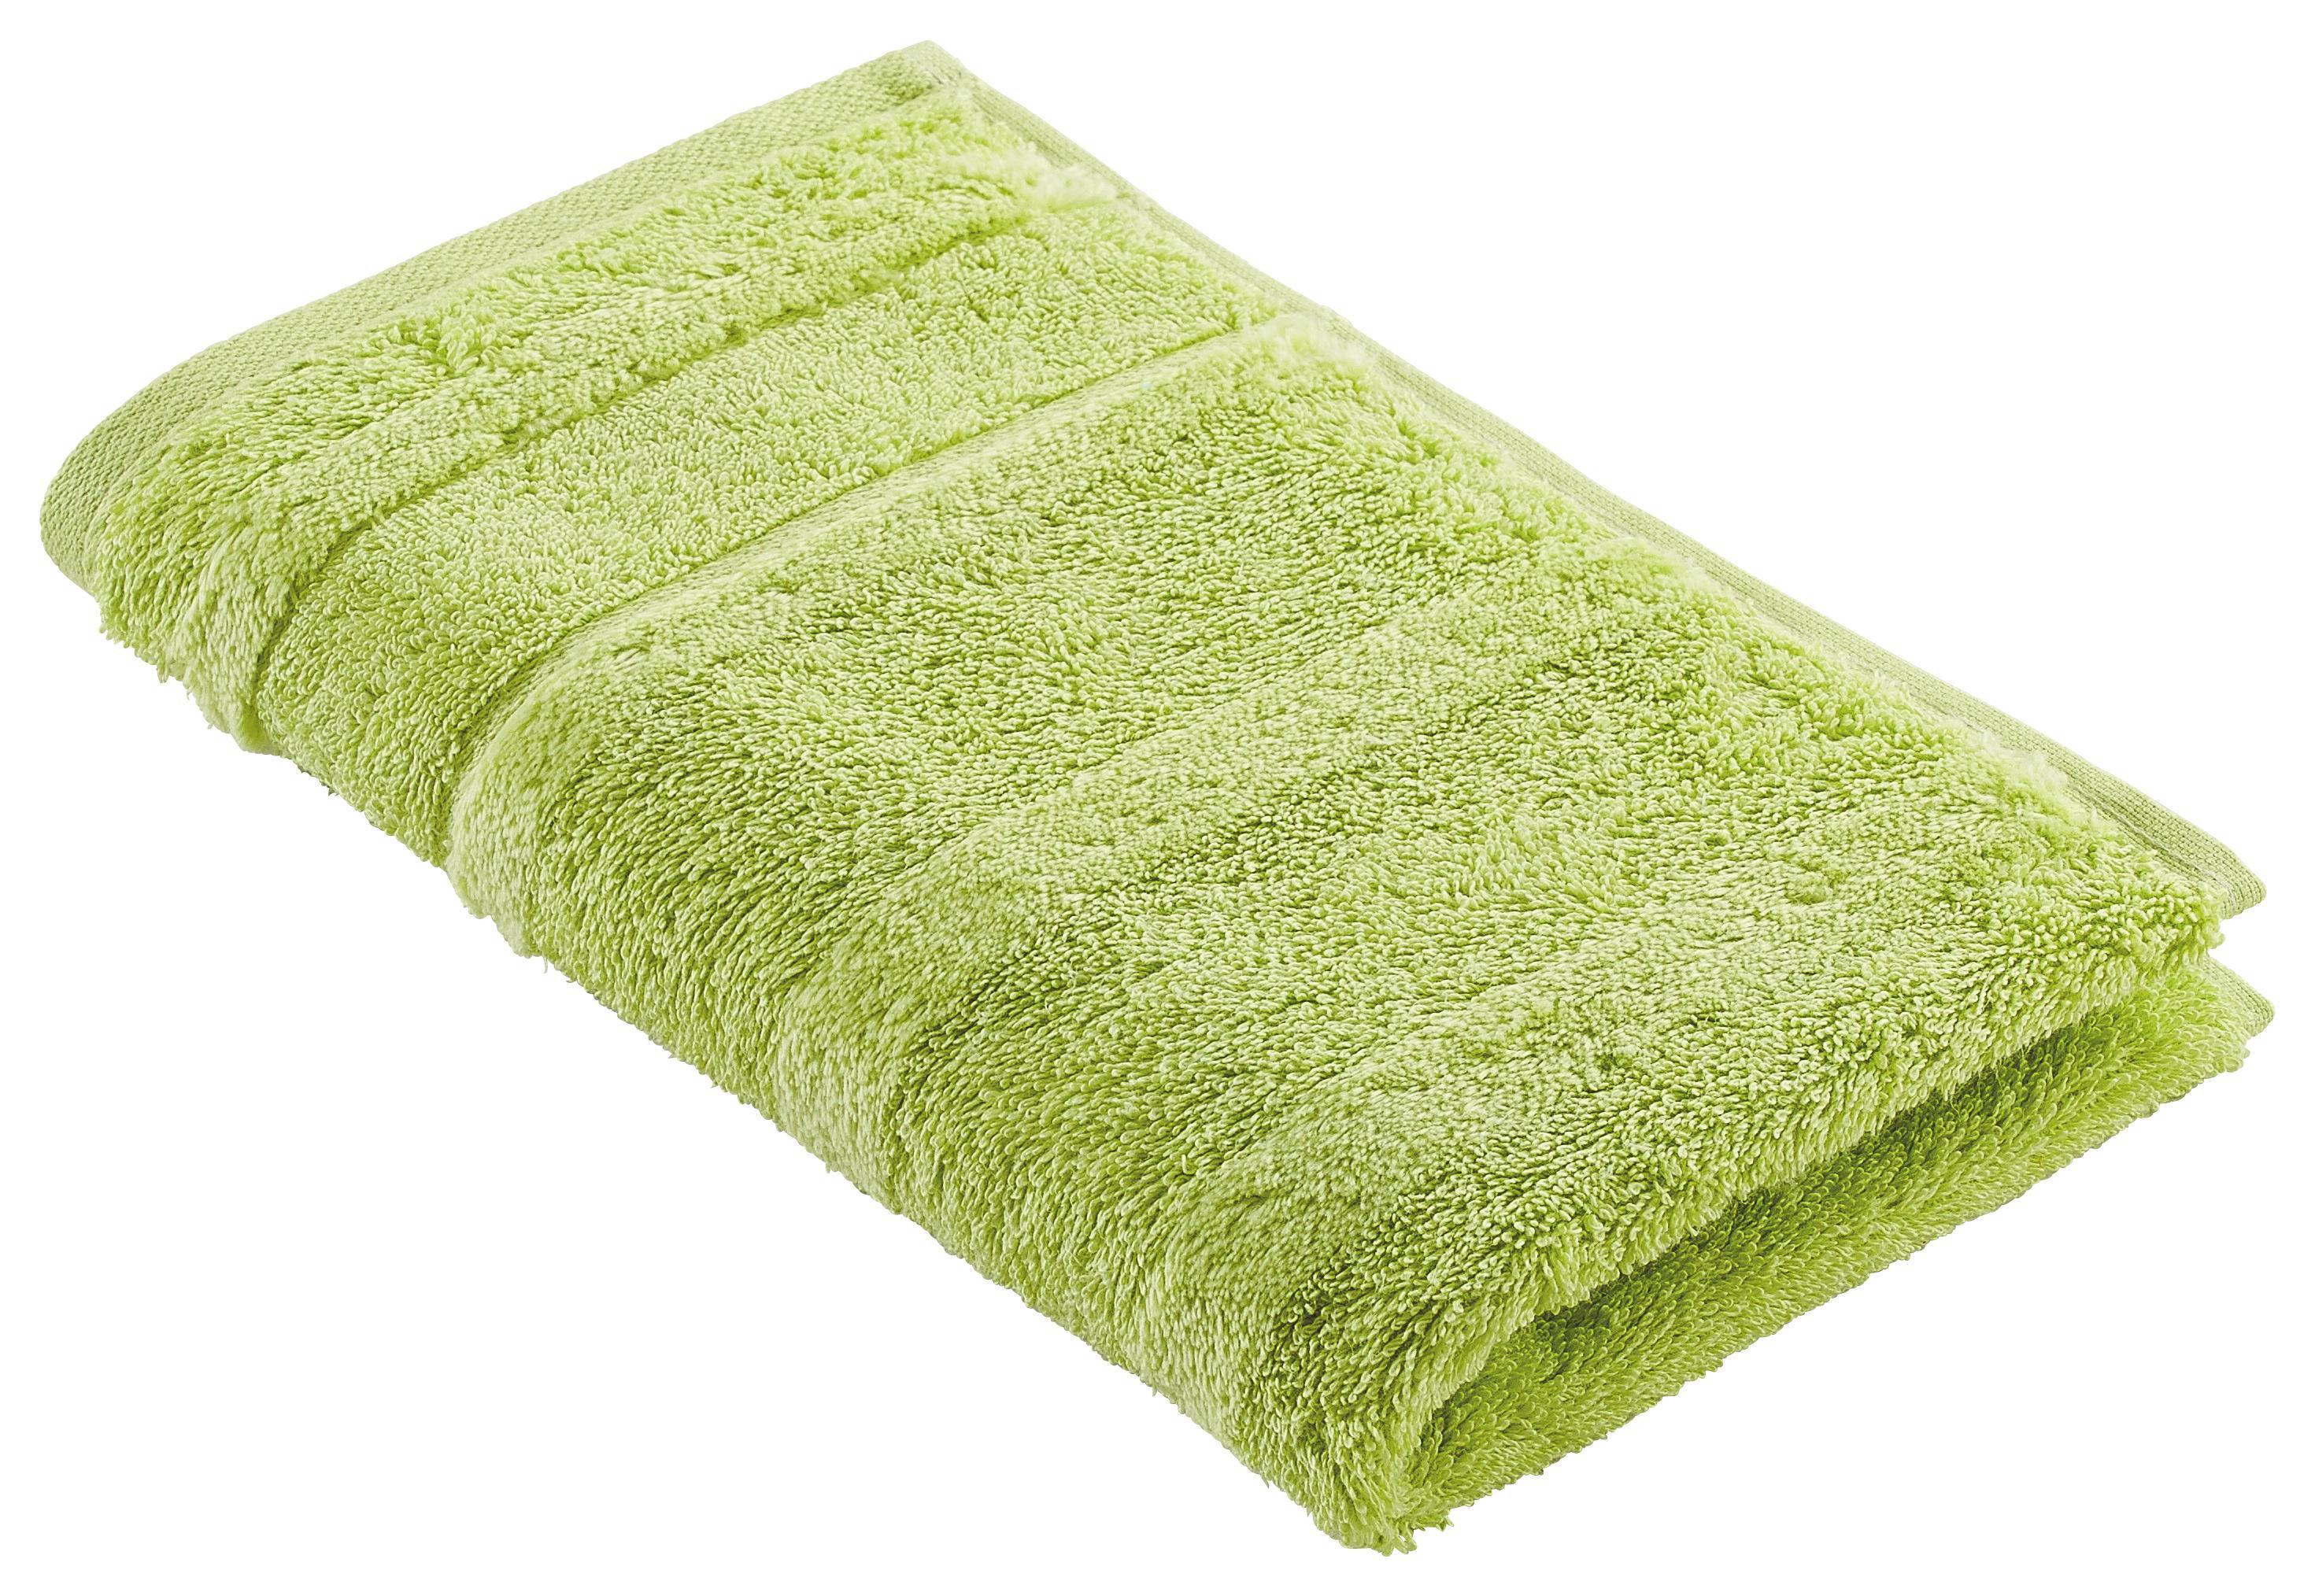 GÄSTETUCH 30/50 cm - Grün, Textil (30/50cm) - CAWOE